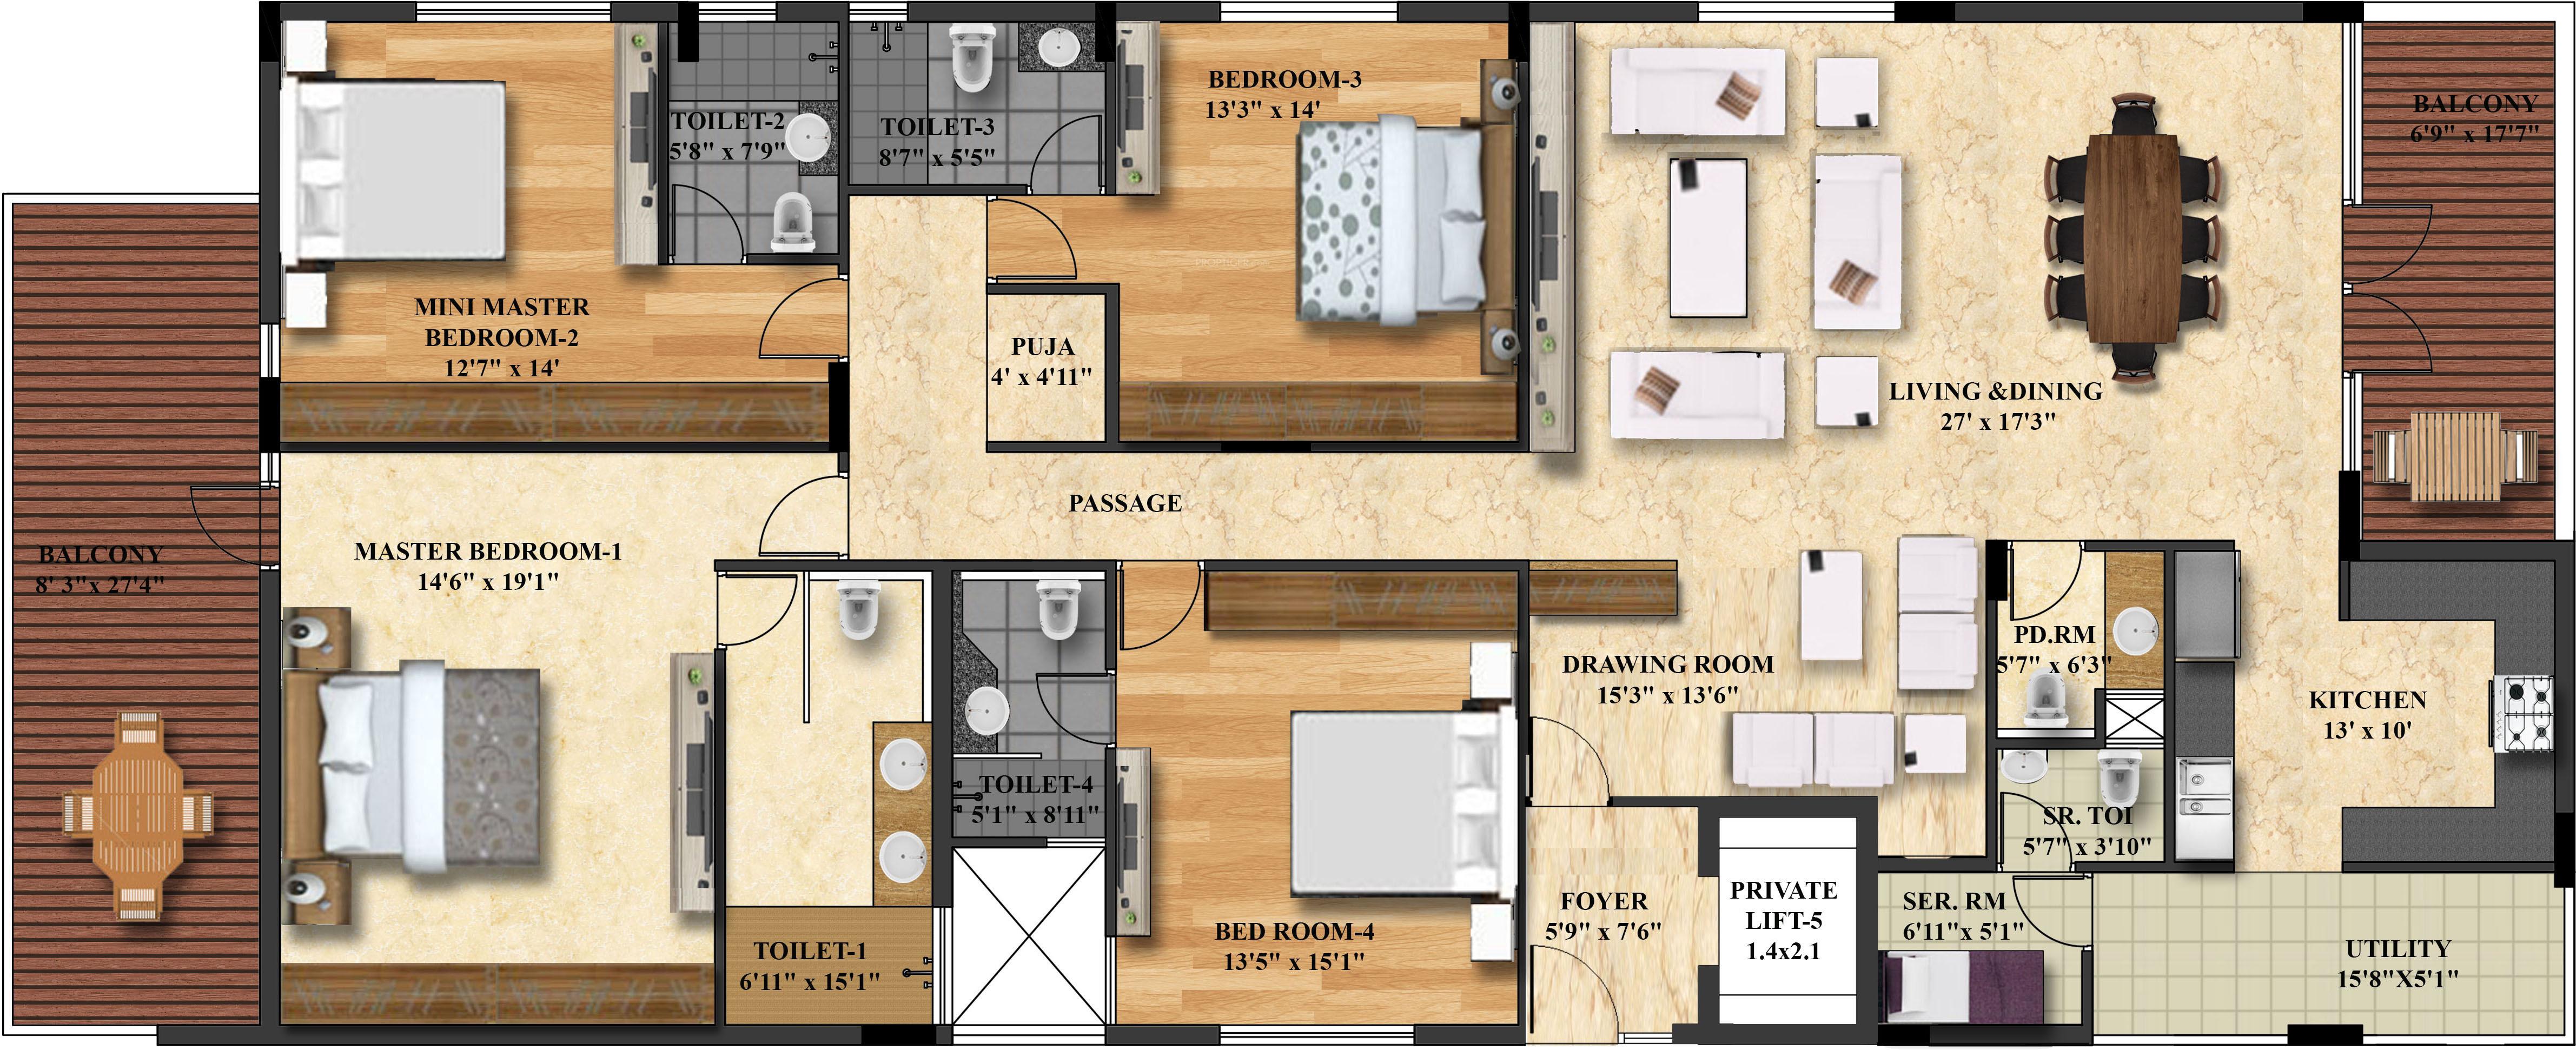 Gar real estate developers amali in banjara hills for Real estate floor plan pricing